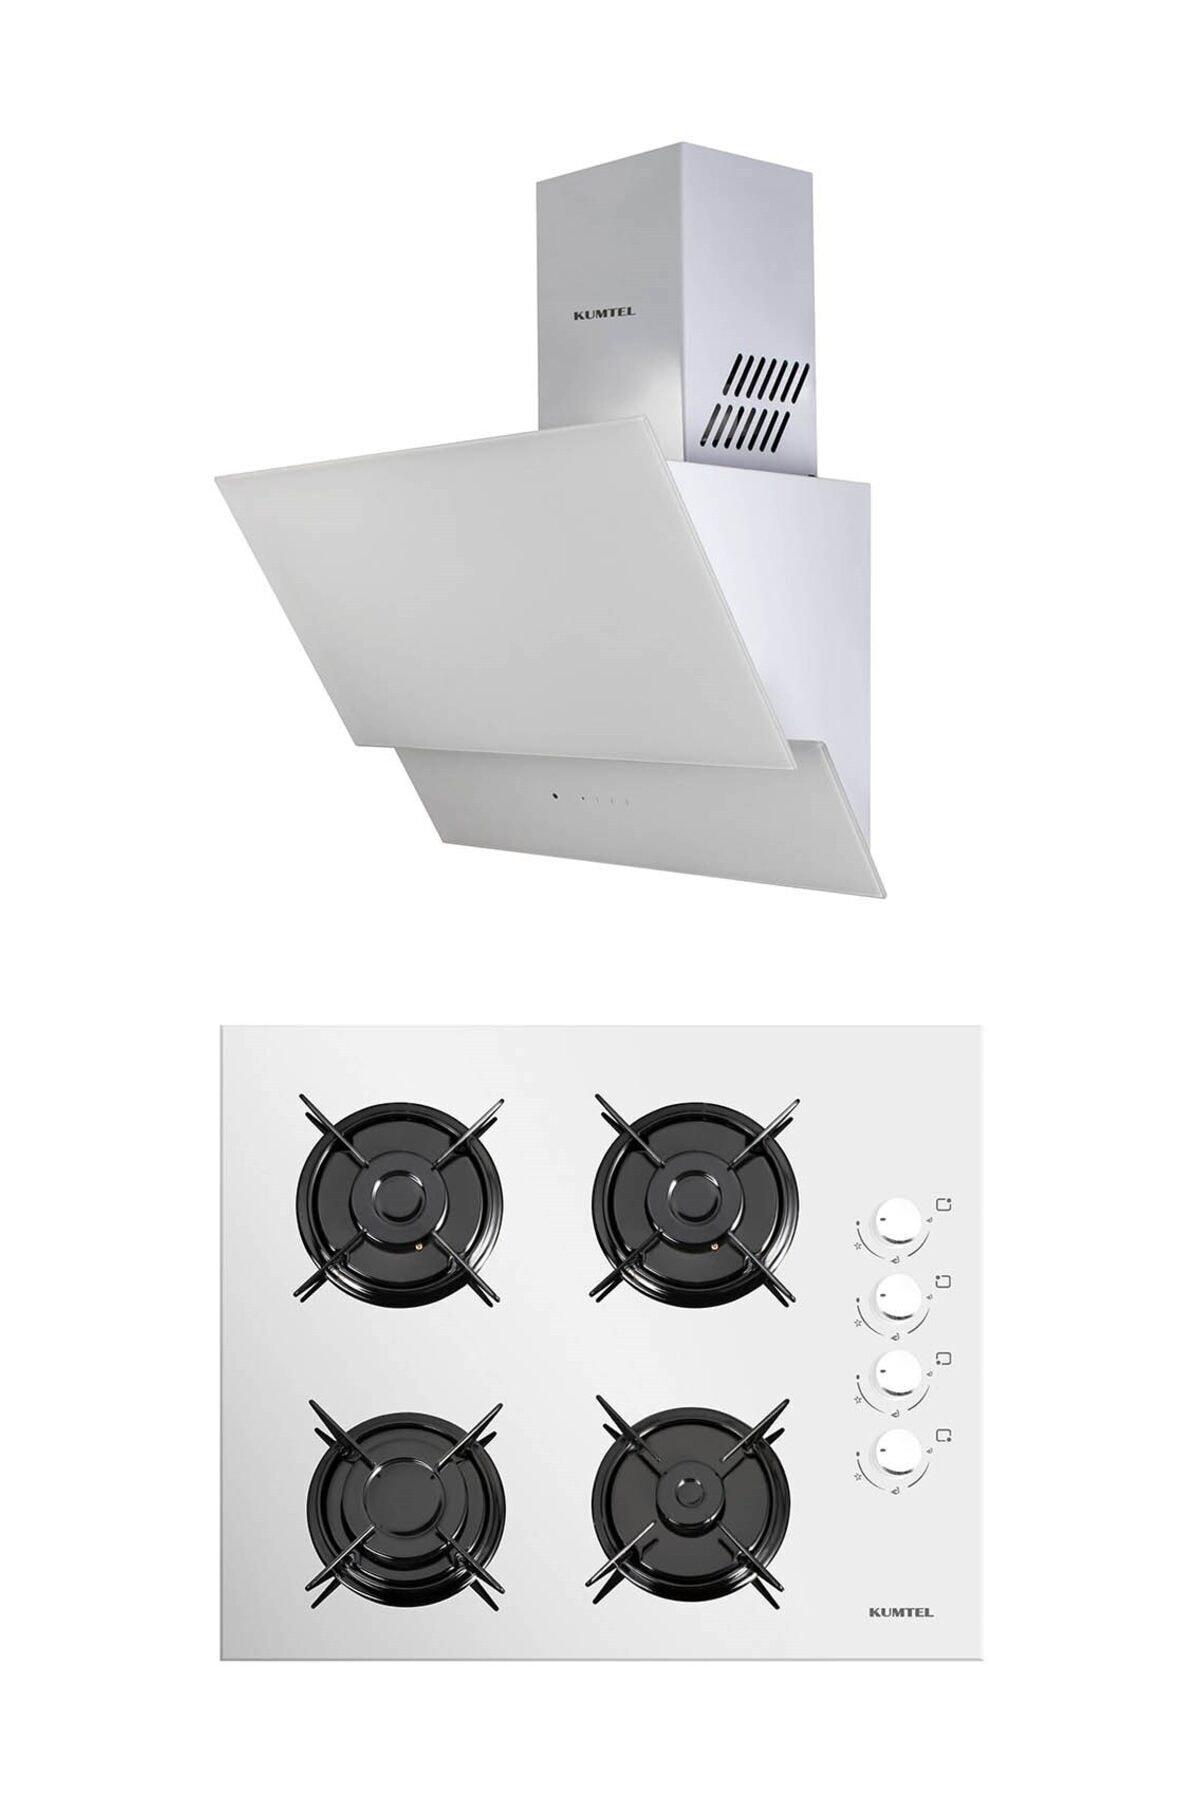 KUMTEL Beyaz 2'li Ankastre Cam Set (Ocak-Dokunmatik Davlumbaz) 1